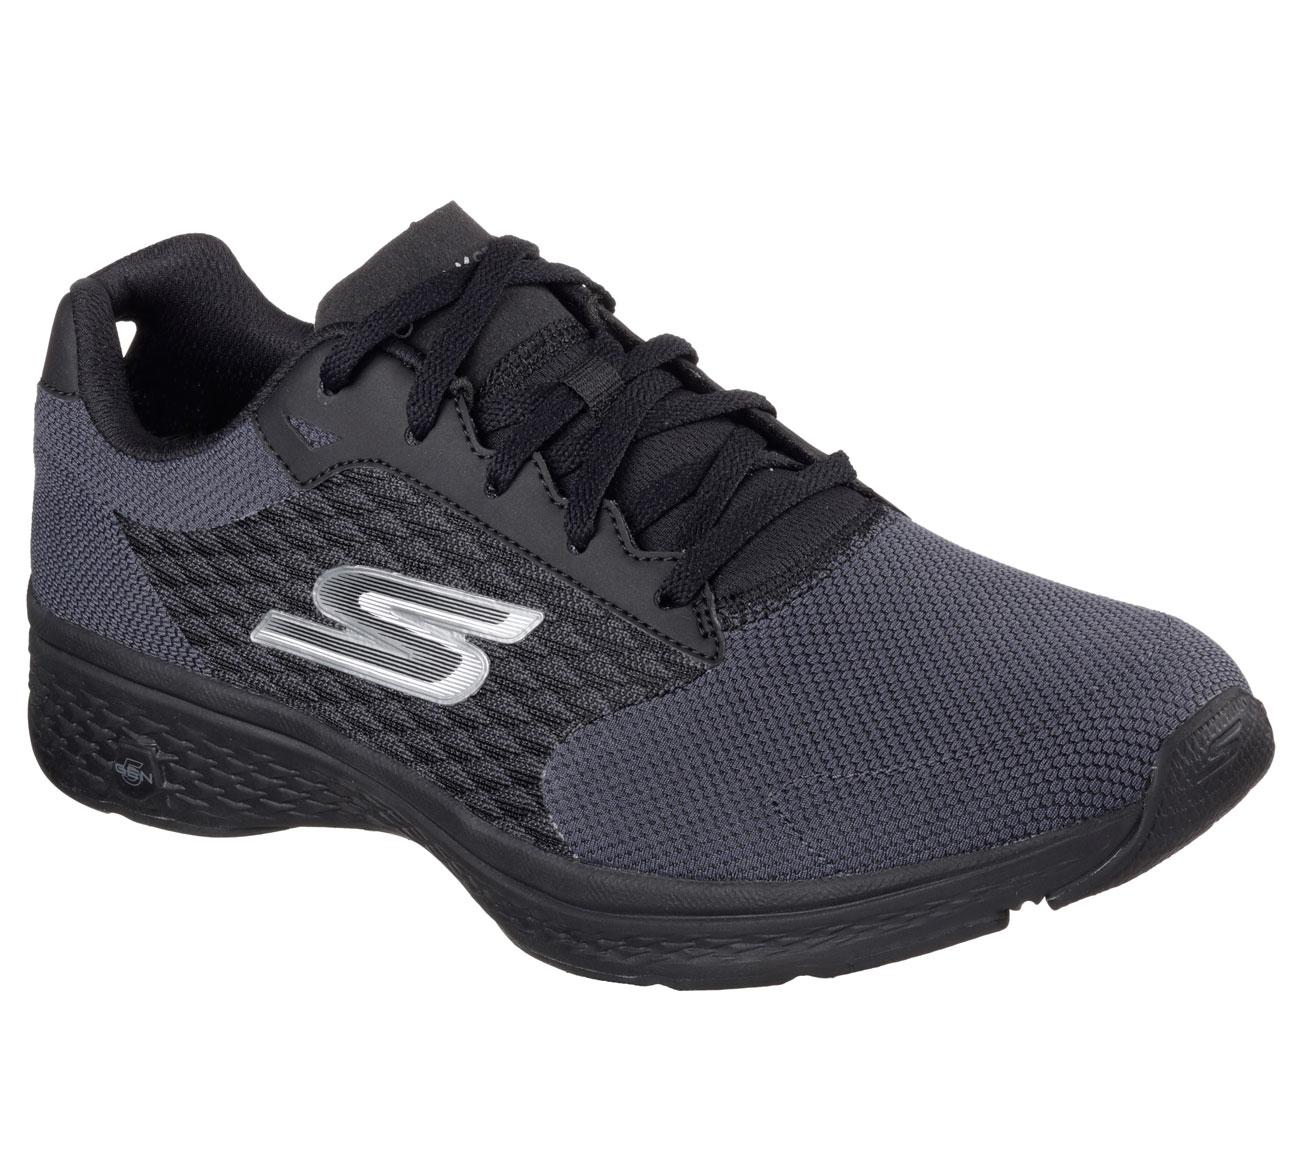 Skechers Go Walk Sport Running shoes for Men Grey